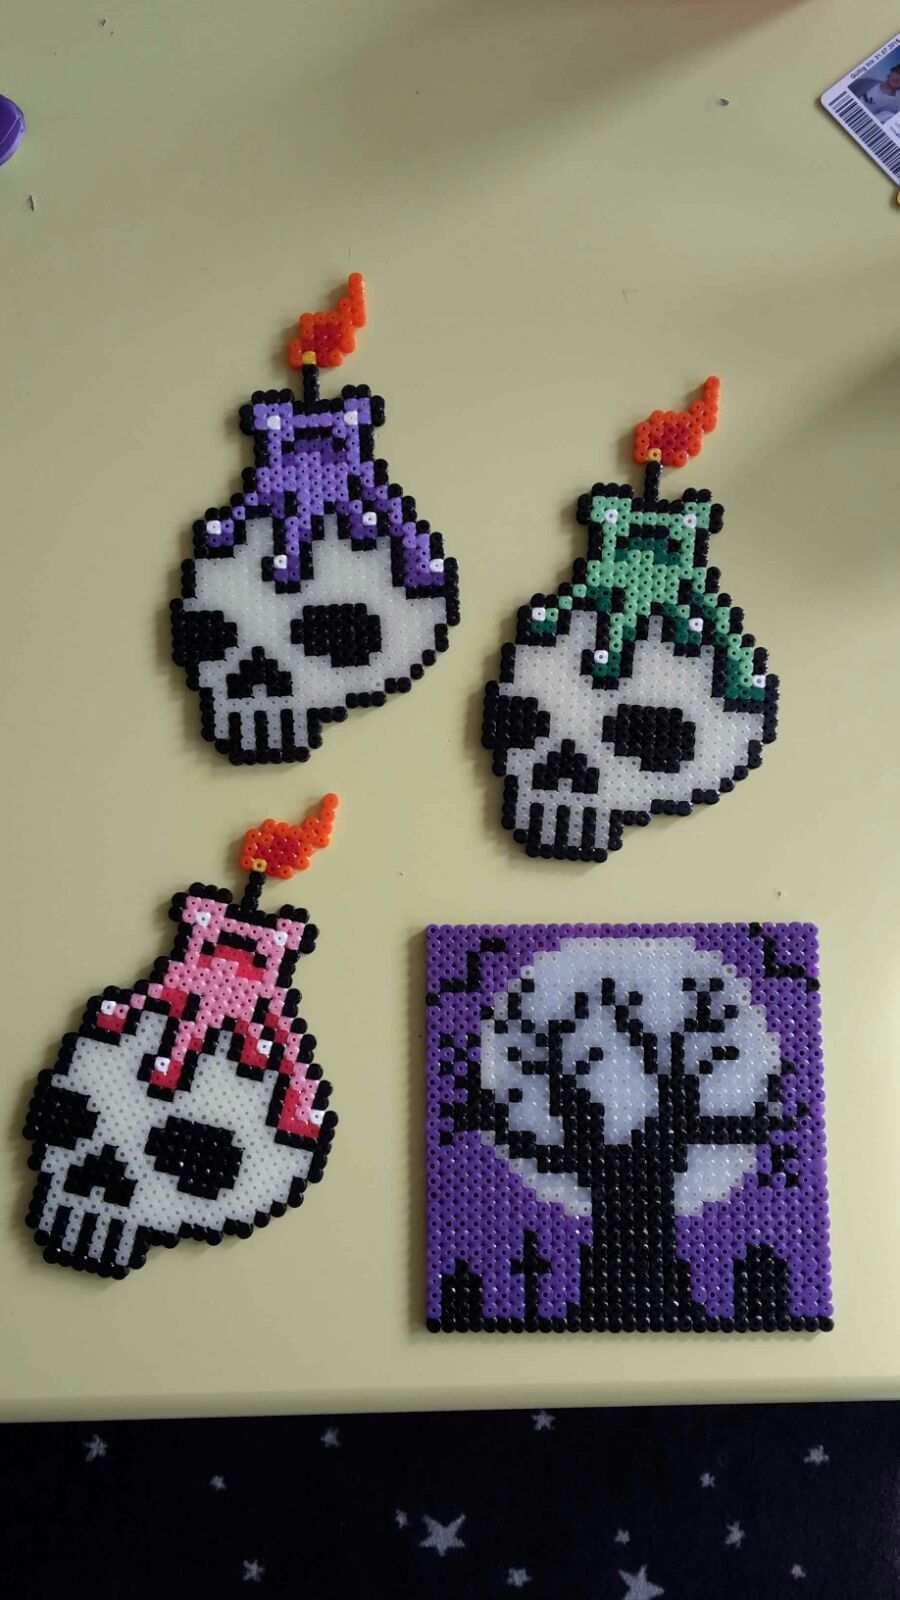 Hama Perler Beads Skulls Glowing In The Dark By Bianca Jung Hama Beads Patterns Perler Bead Templates Perler Crafts